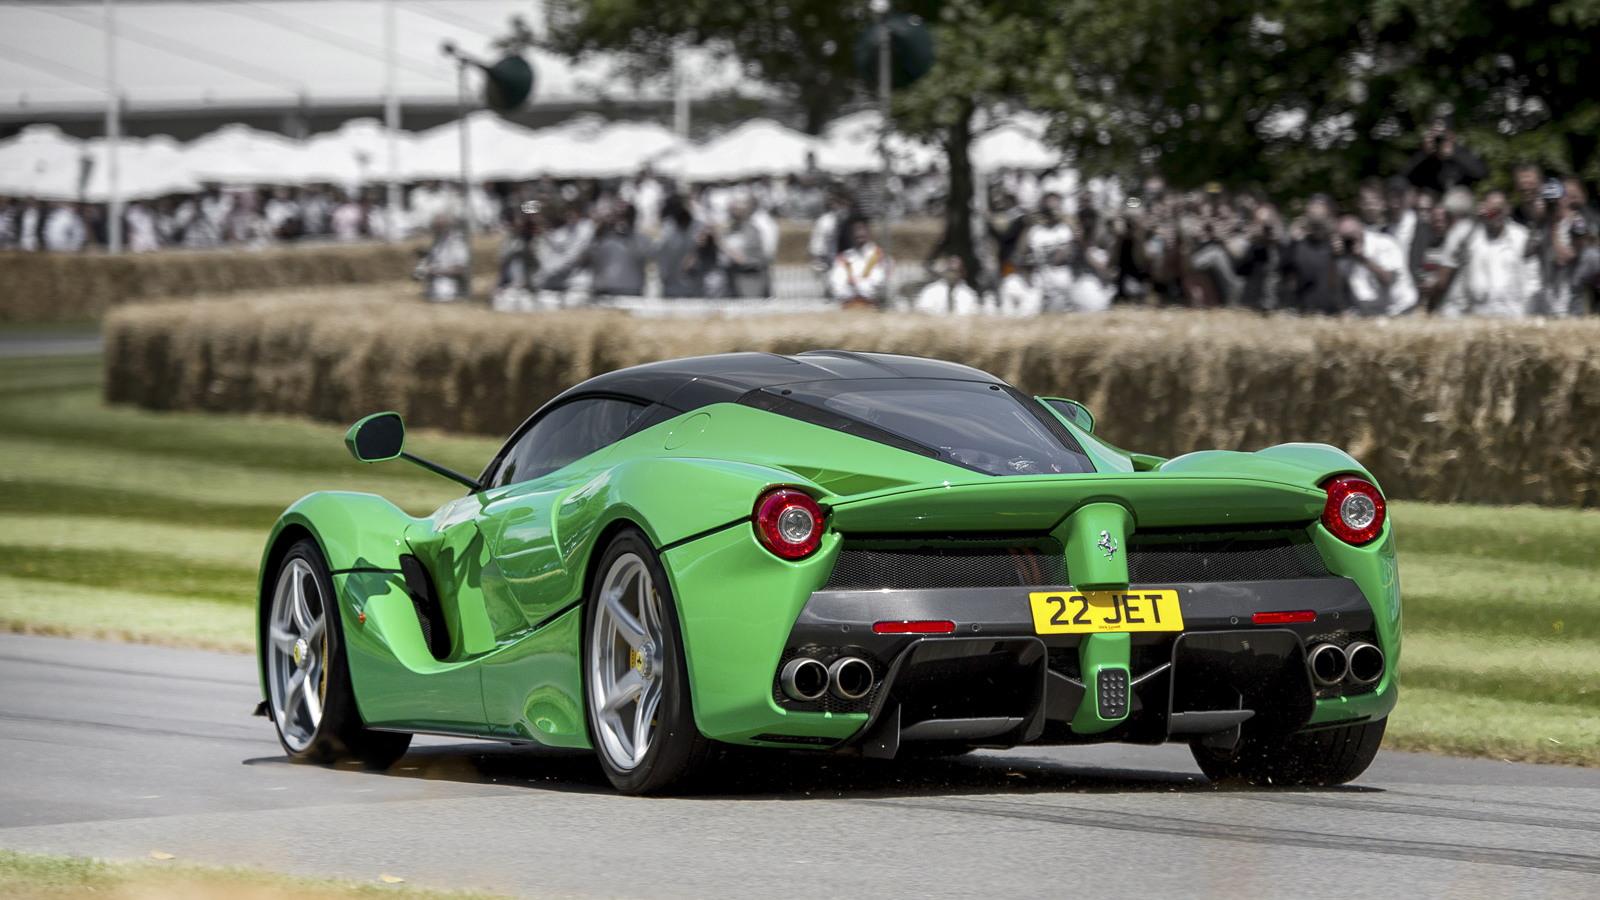 Ferrari at the 2014 Goodwood Festival of Speed